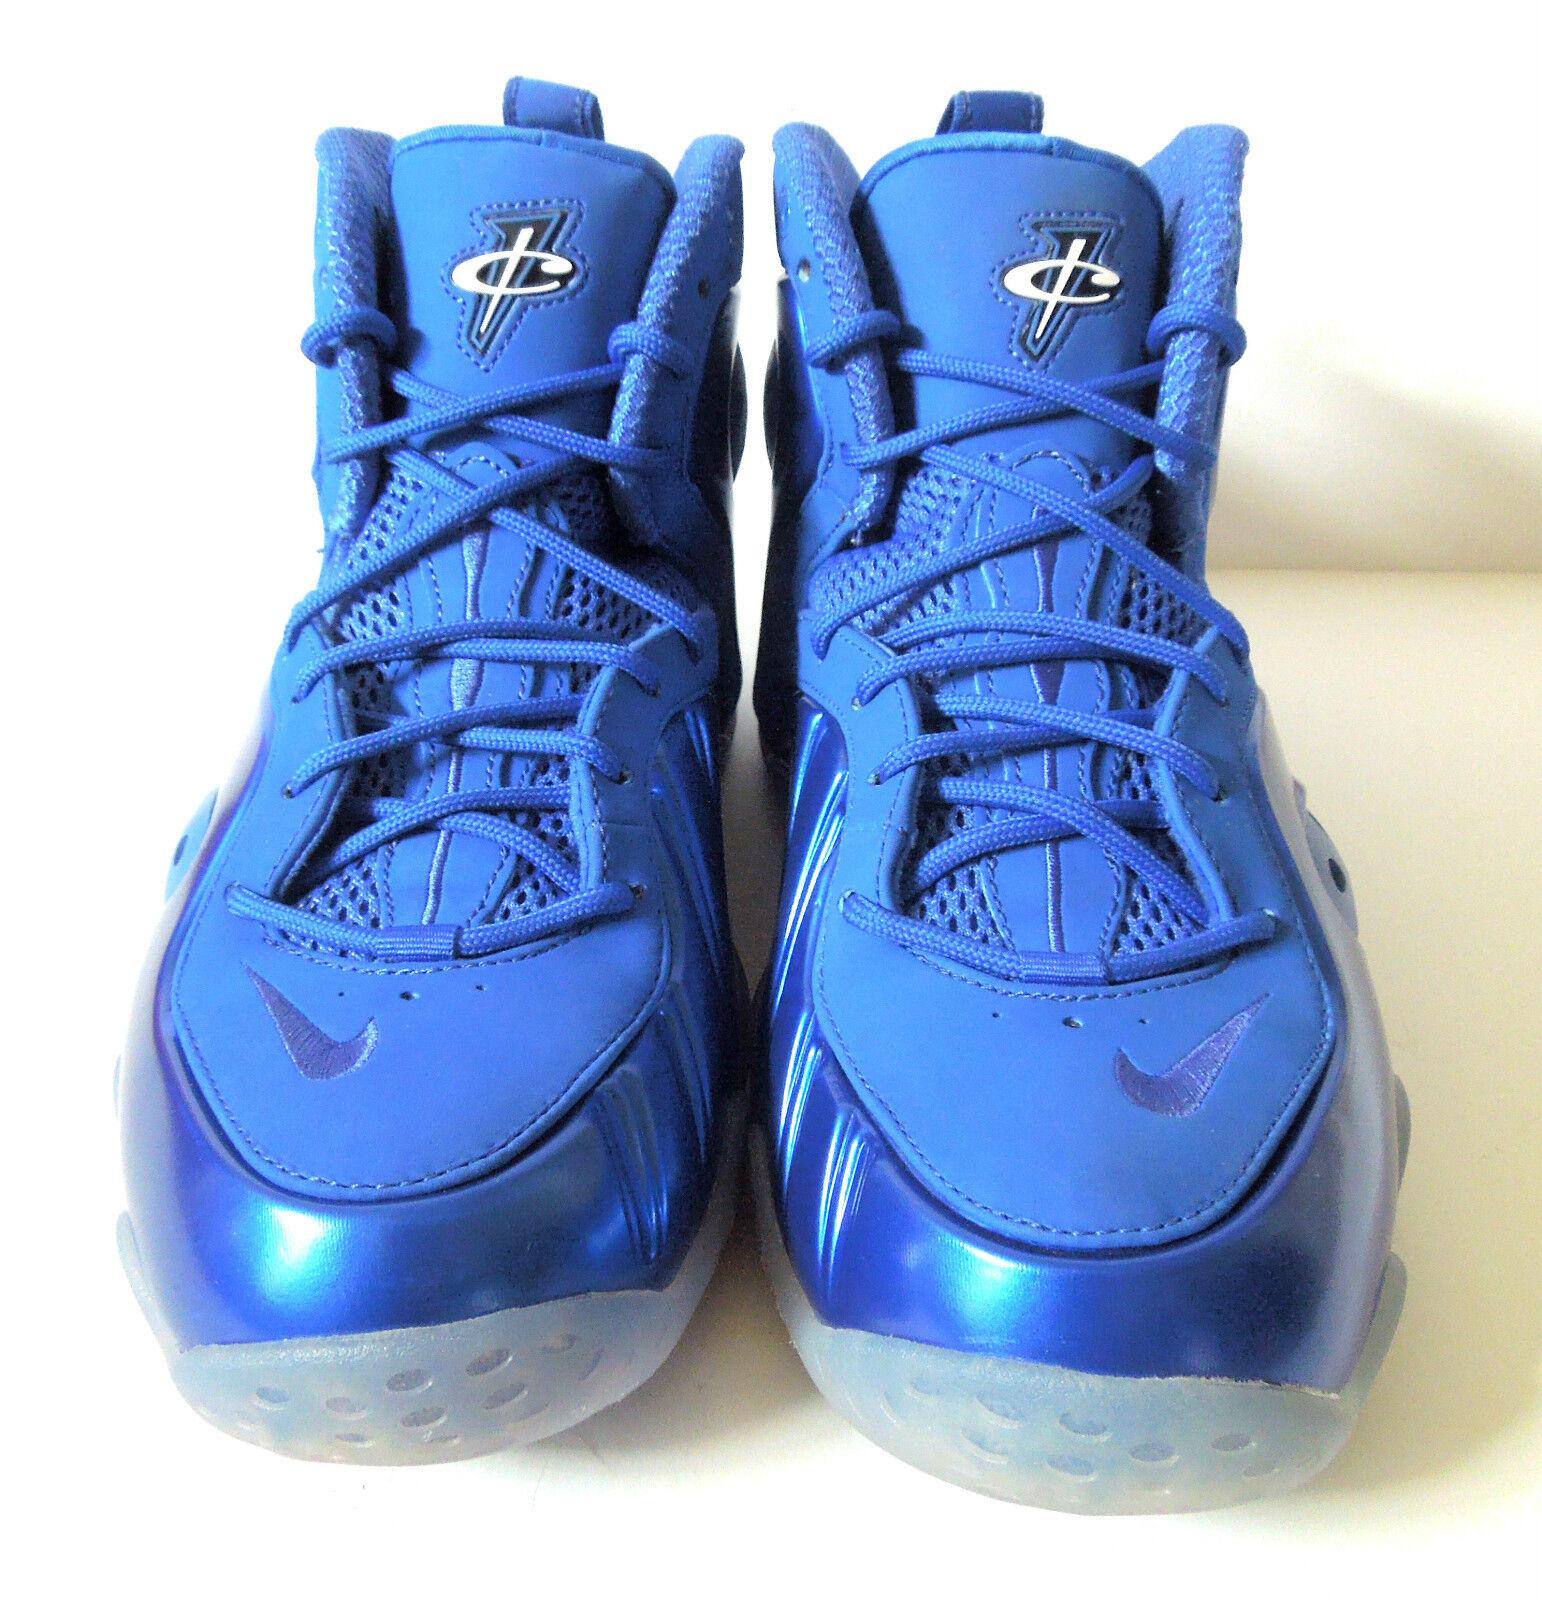 Nike Nike Nike zoom - neuling dynamisches spiel royal sz 8,5 [472688-403] 3fc672